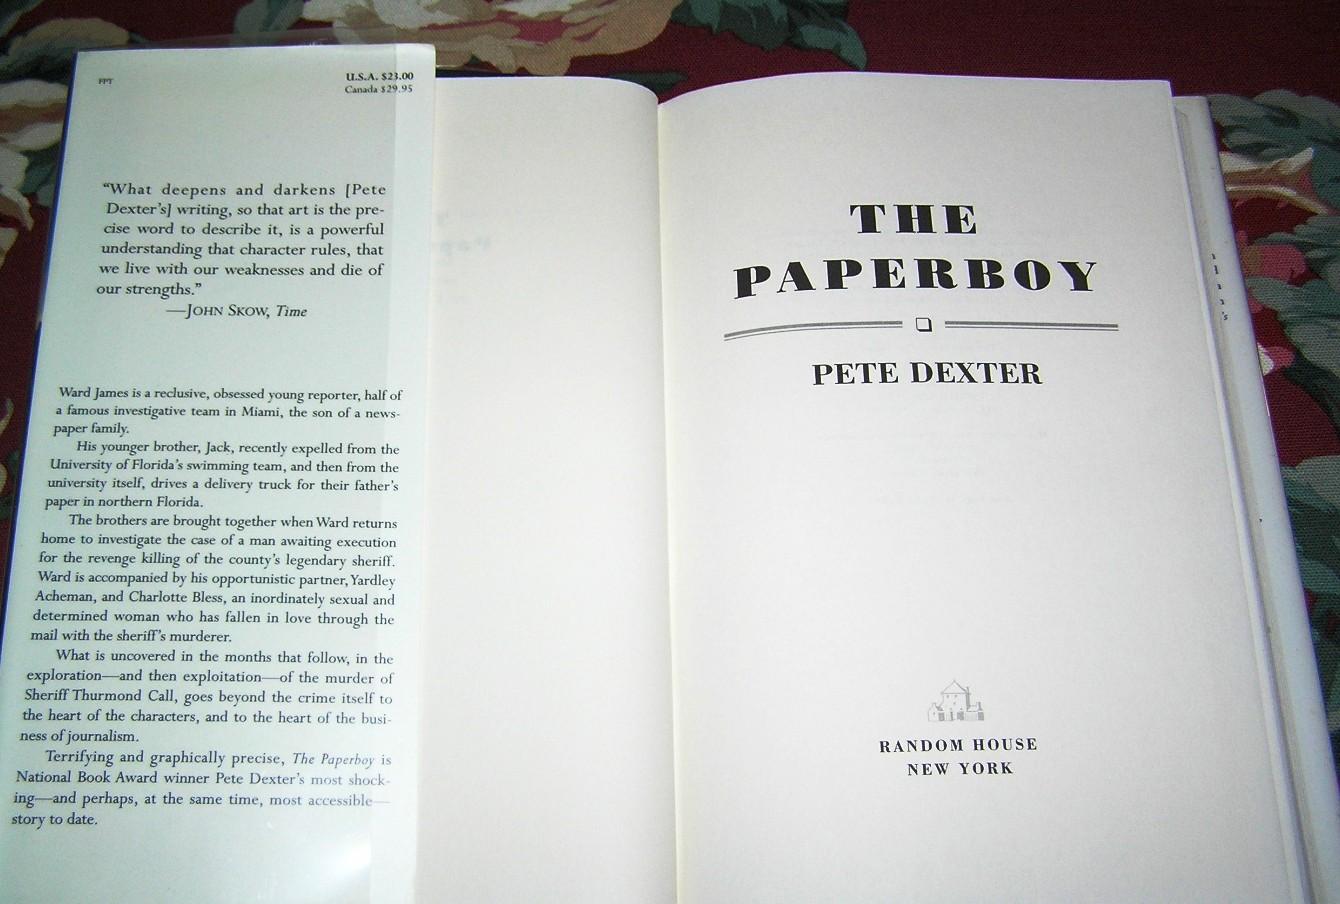 pete dexter paperboy